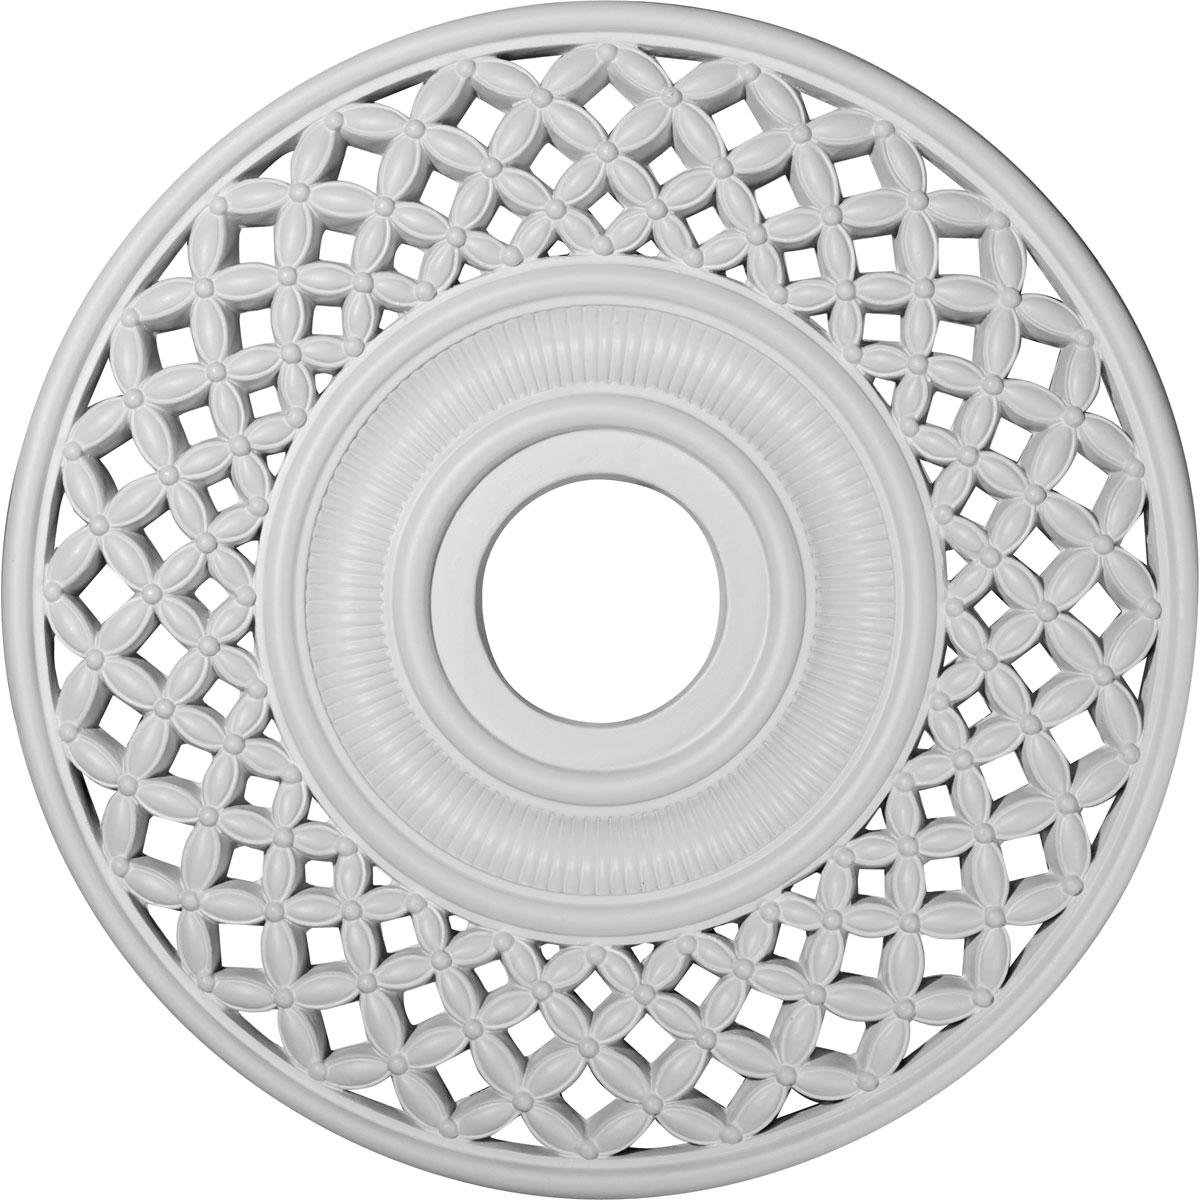 medallions piece dp invitinghome california amazon split com ceiling medallion primed decorative white